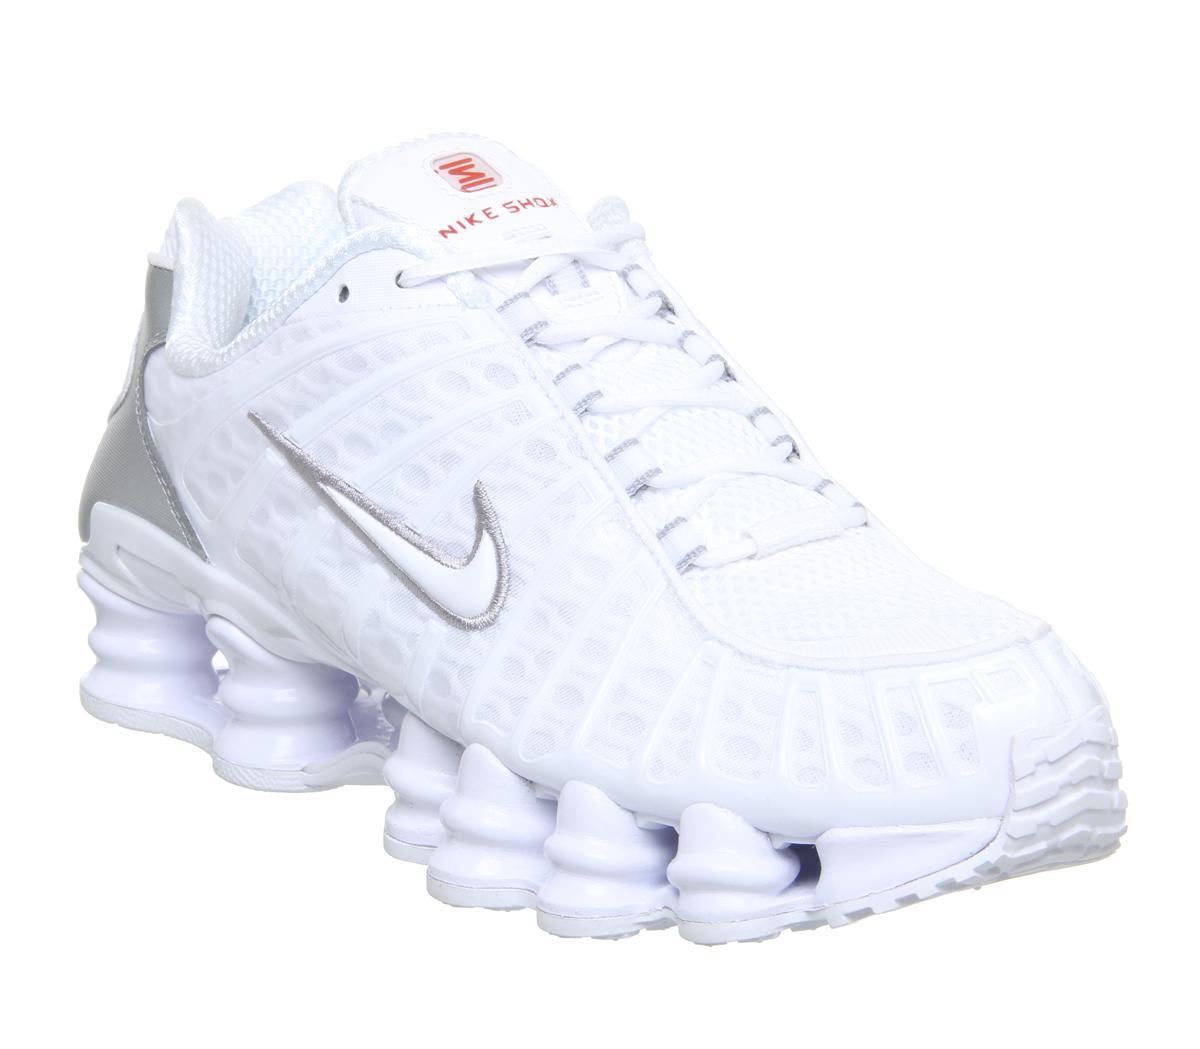 Alegre Fracción evitar  Nike Nike Shox Tl Trainers White White Metallic Silver Max Orange ...